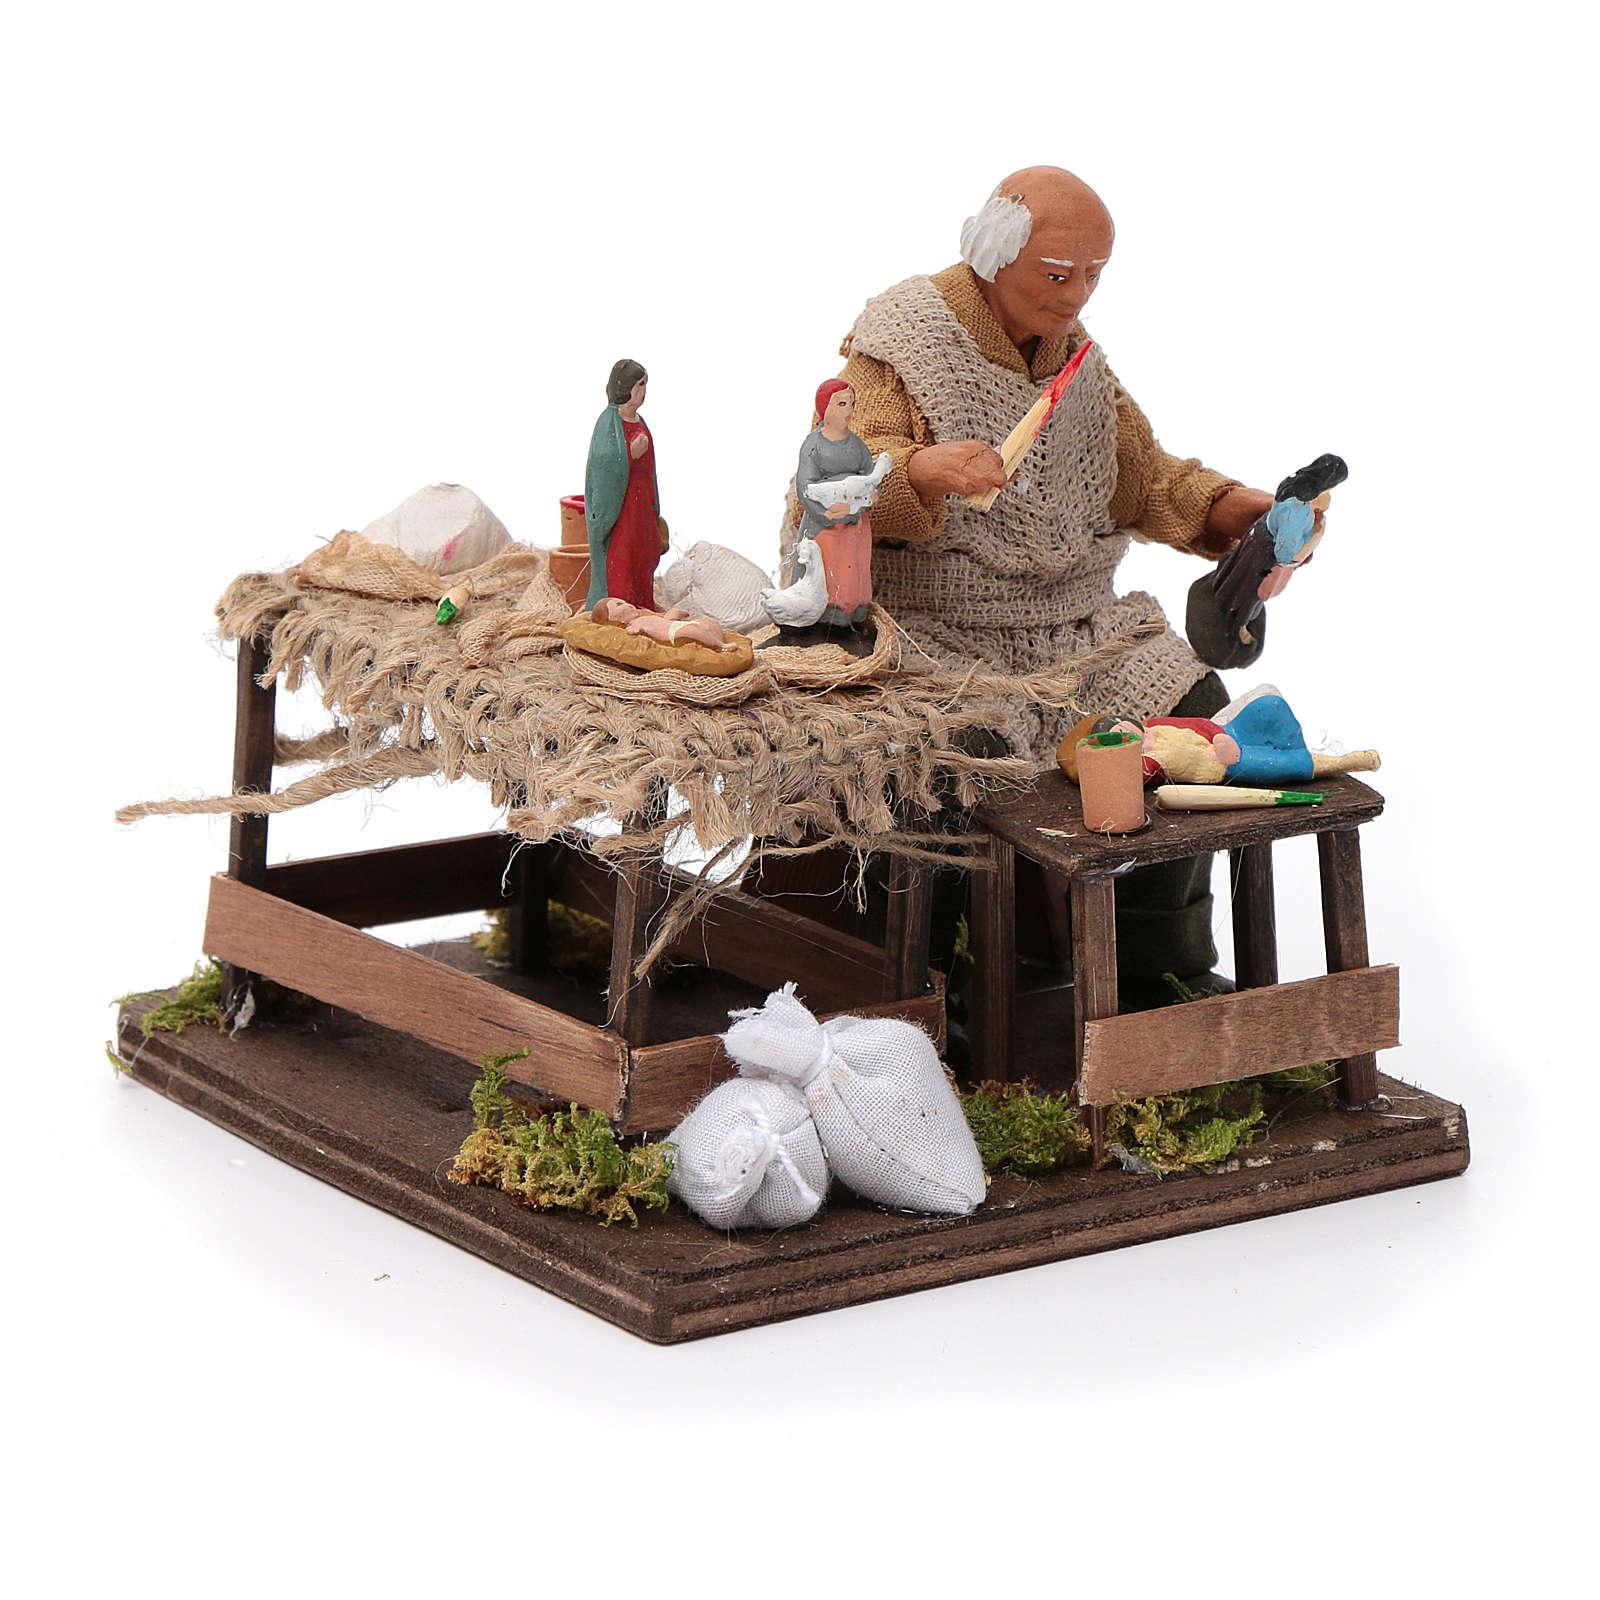 Ceramista con pastori 12 cm presepe napoletano 4